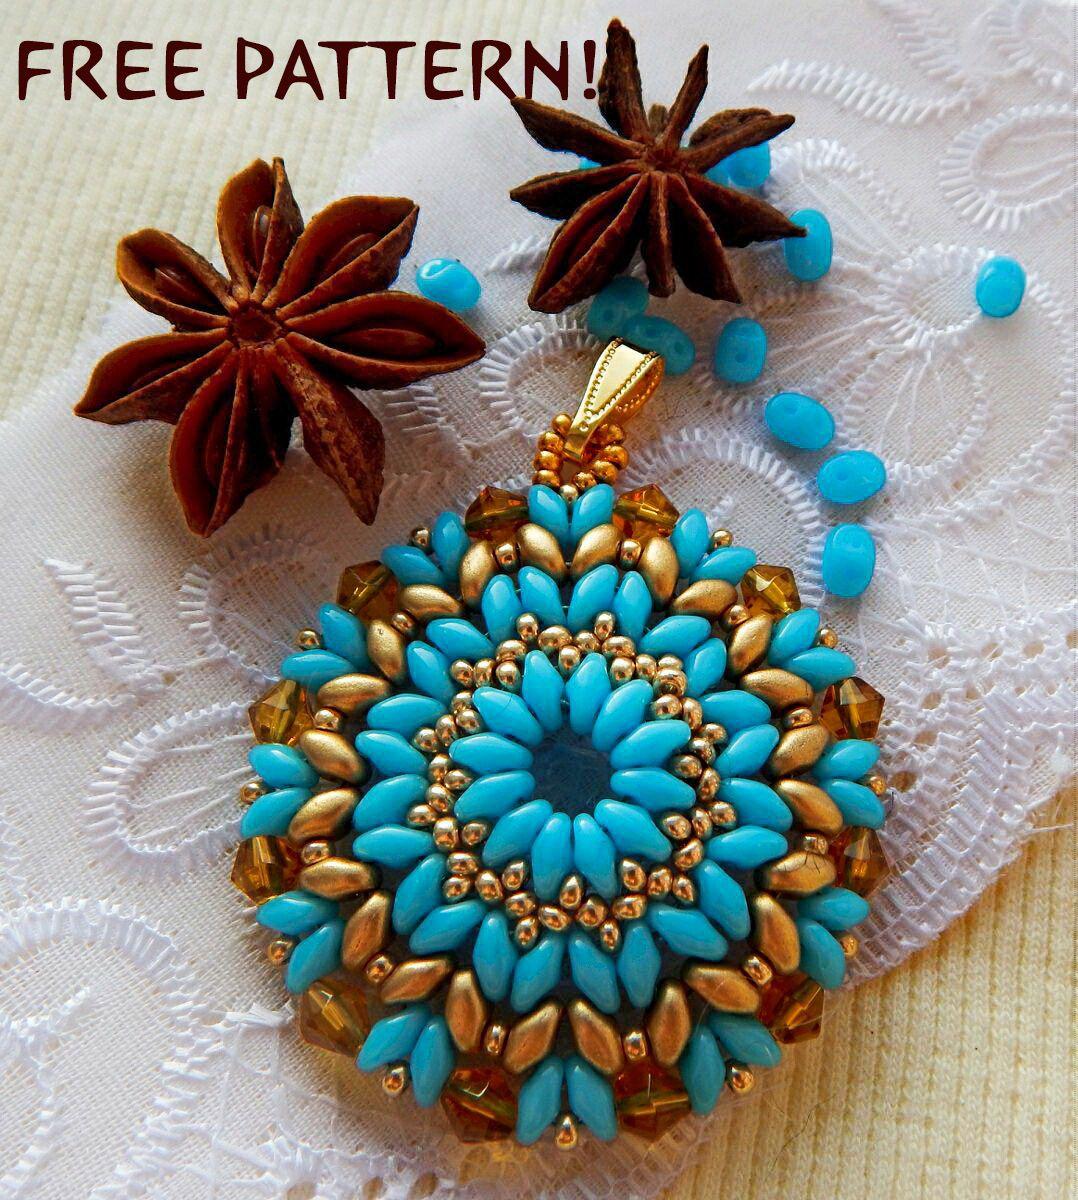 Free Bead Patterns Magnificent Design Inspiration